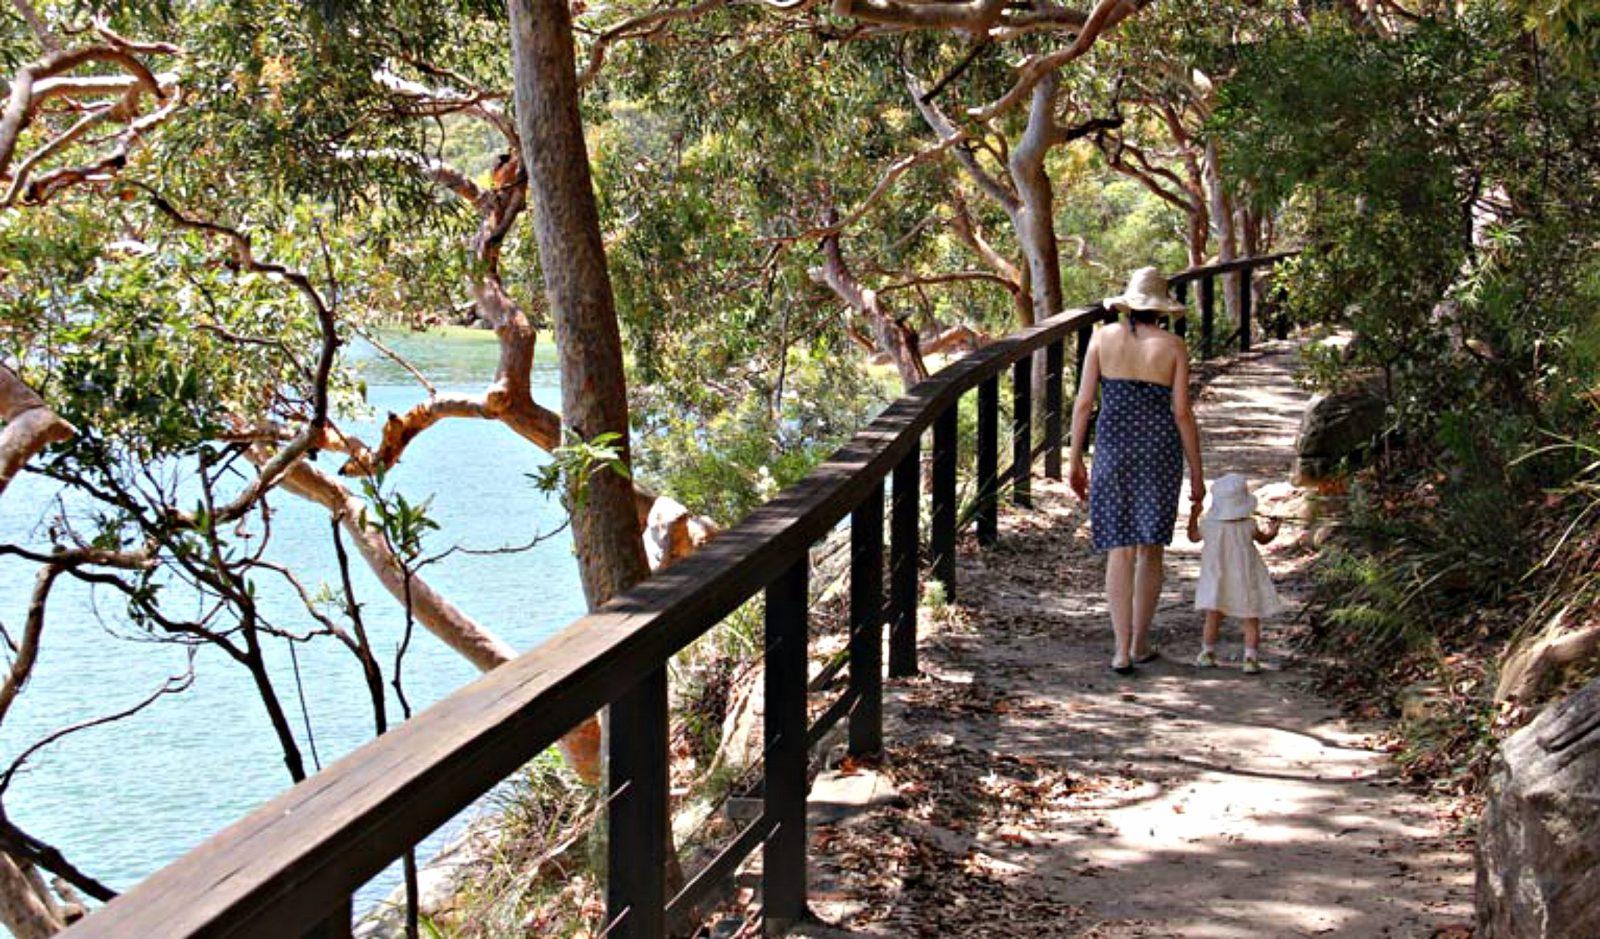 Harbour Bridge to The Spit Bridge walk, Sydney Harbour National Park. Photo: John Yurasek